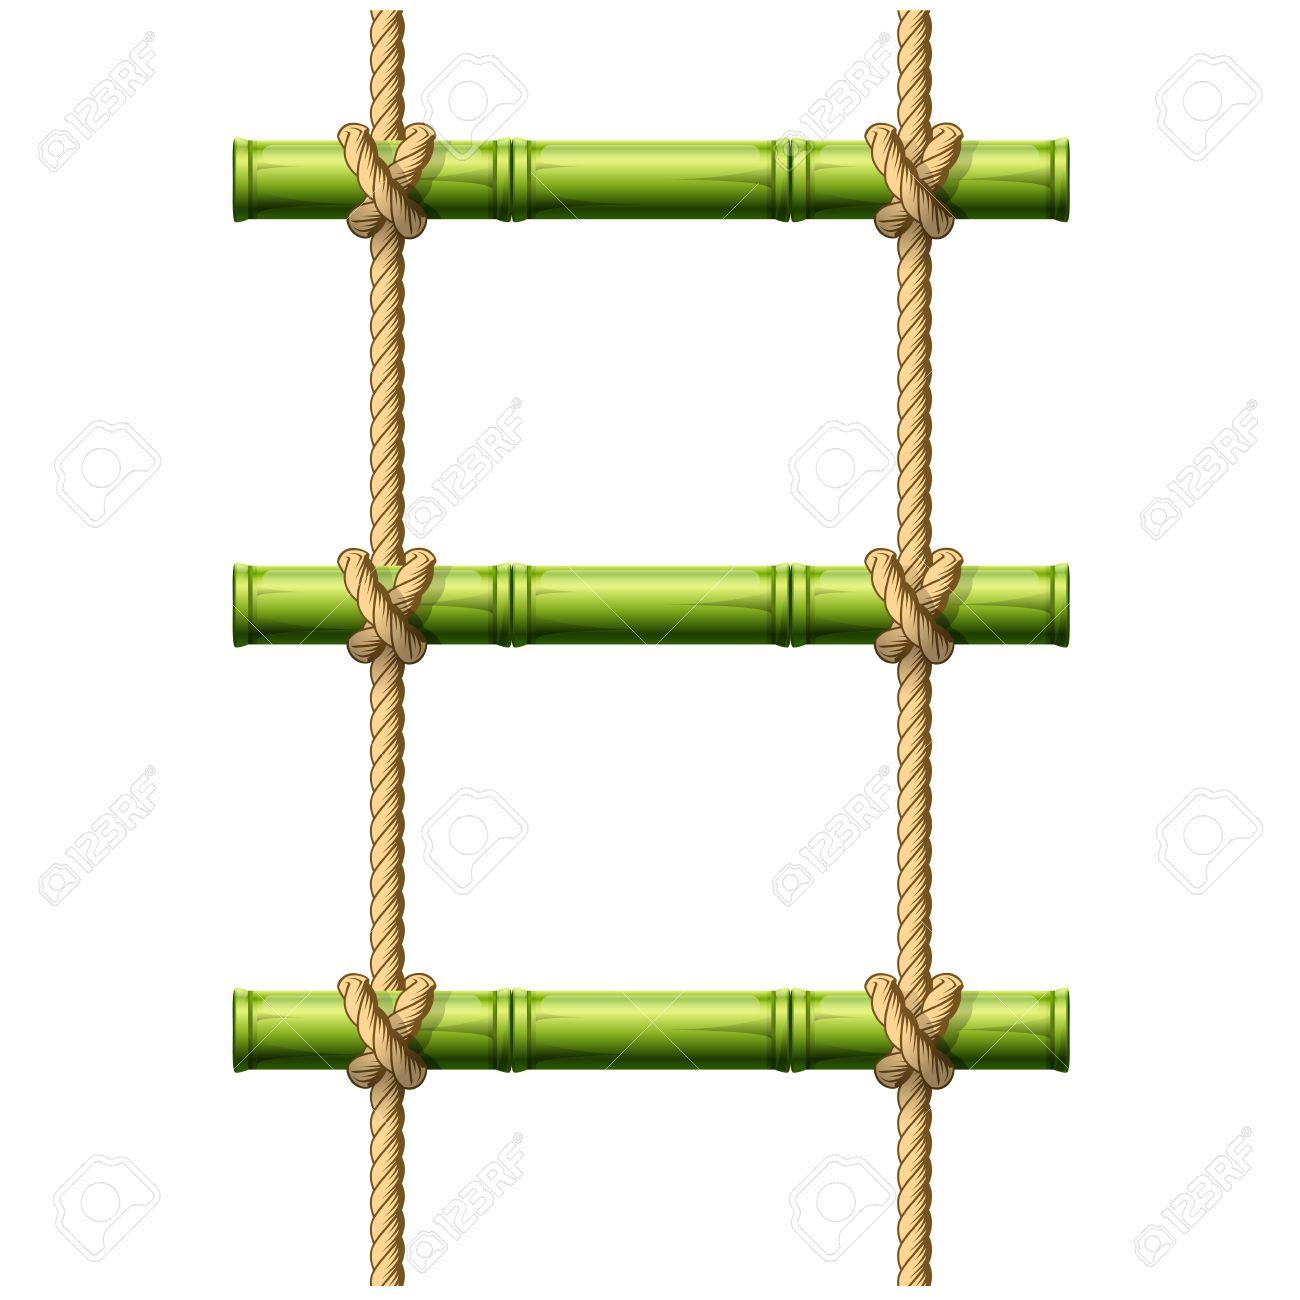 Bamboo Rope Ladder.